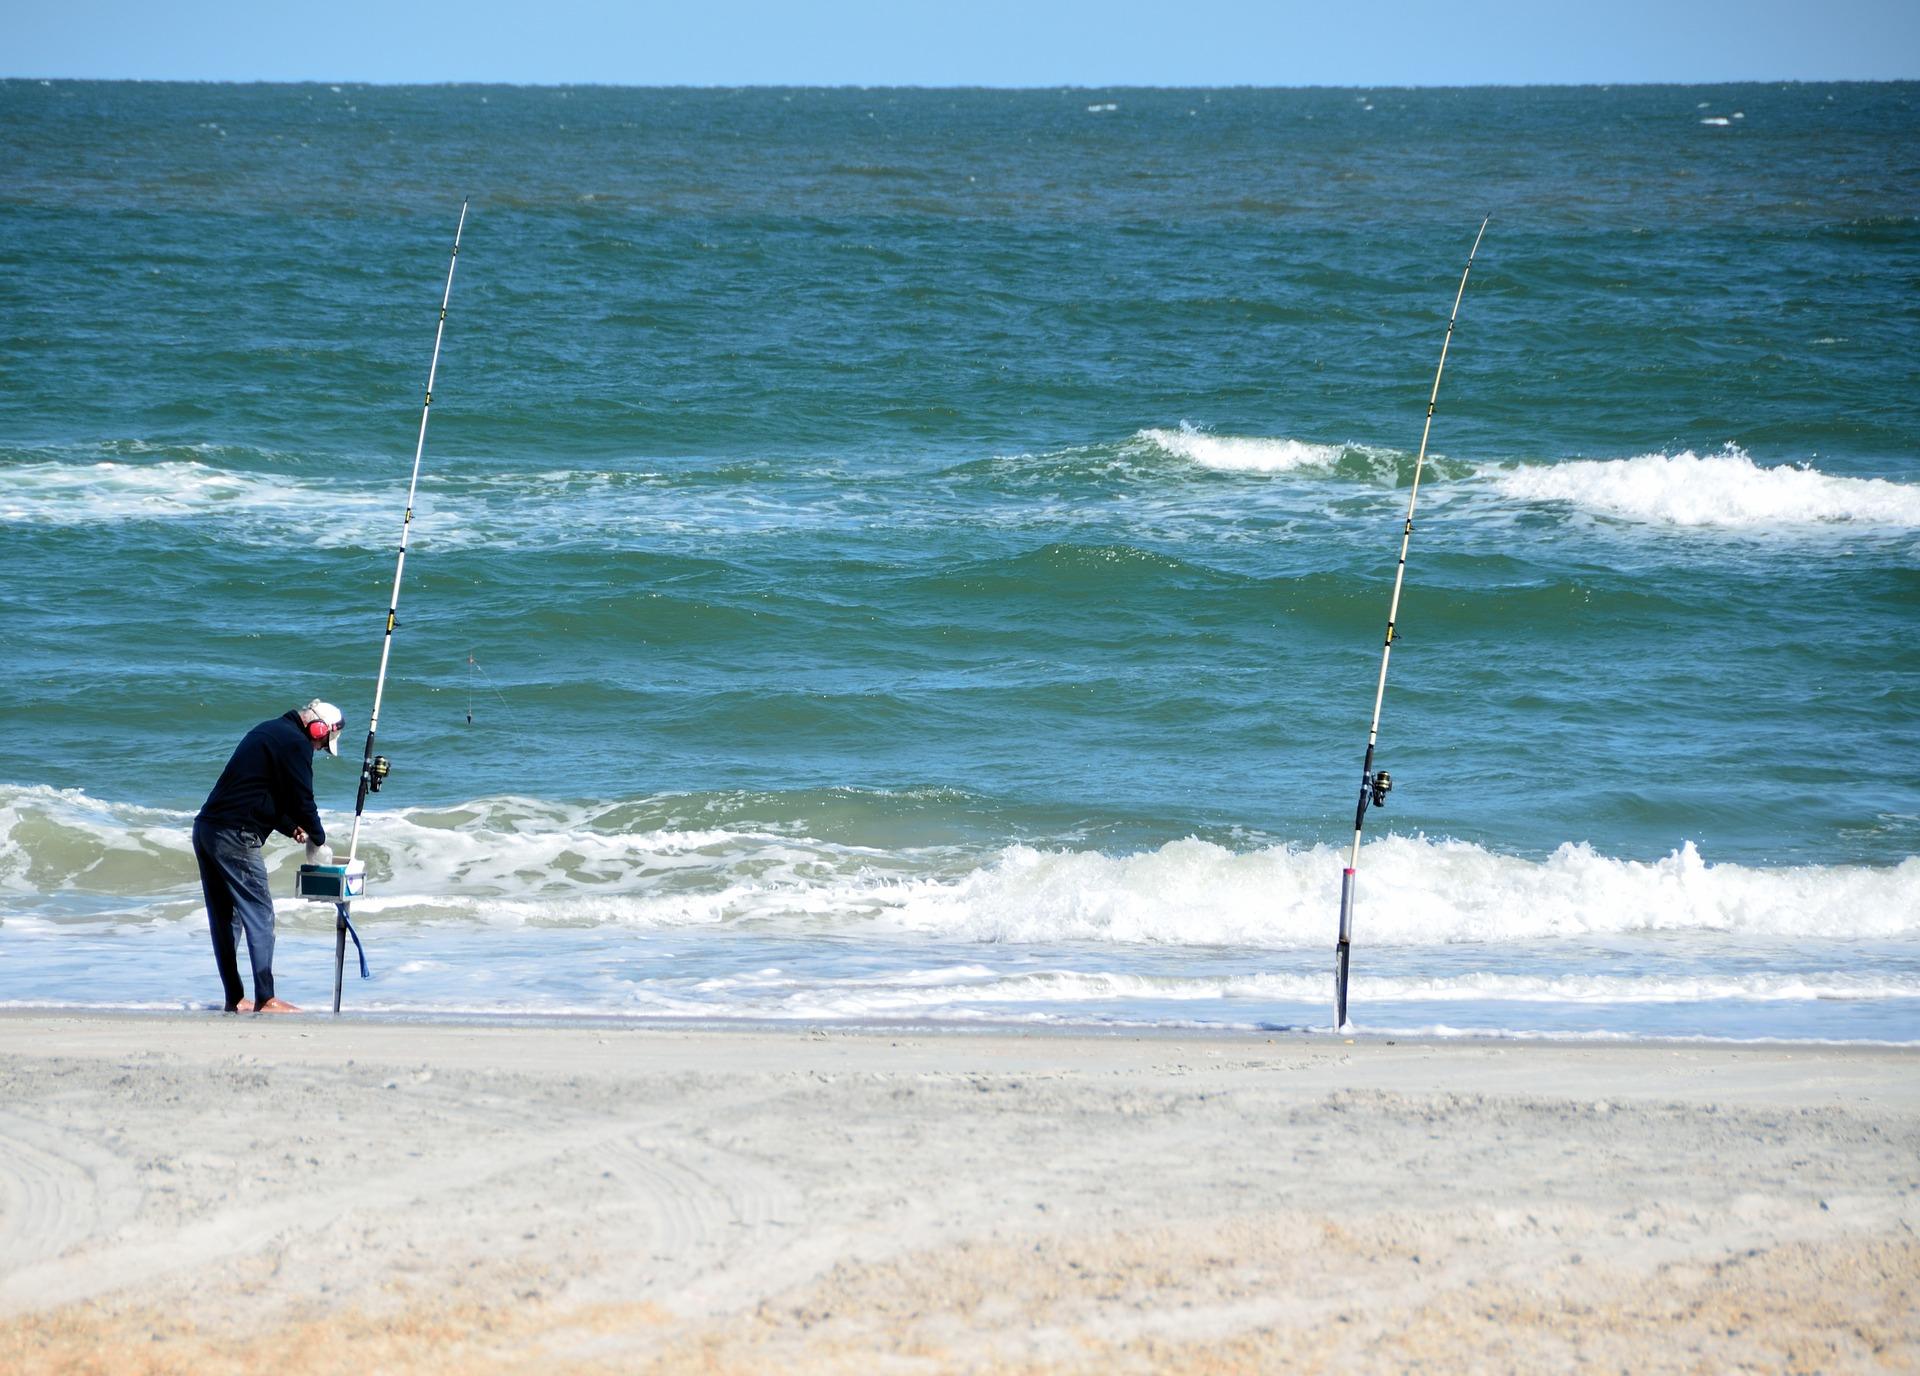 surf-fisherman-2069142_1920.jpg